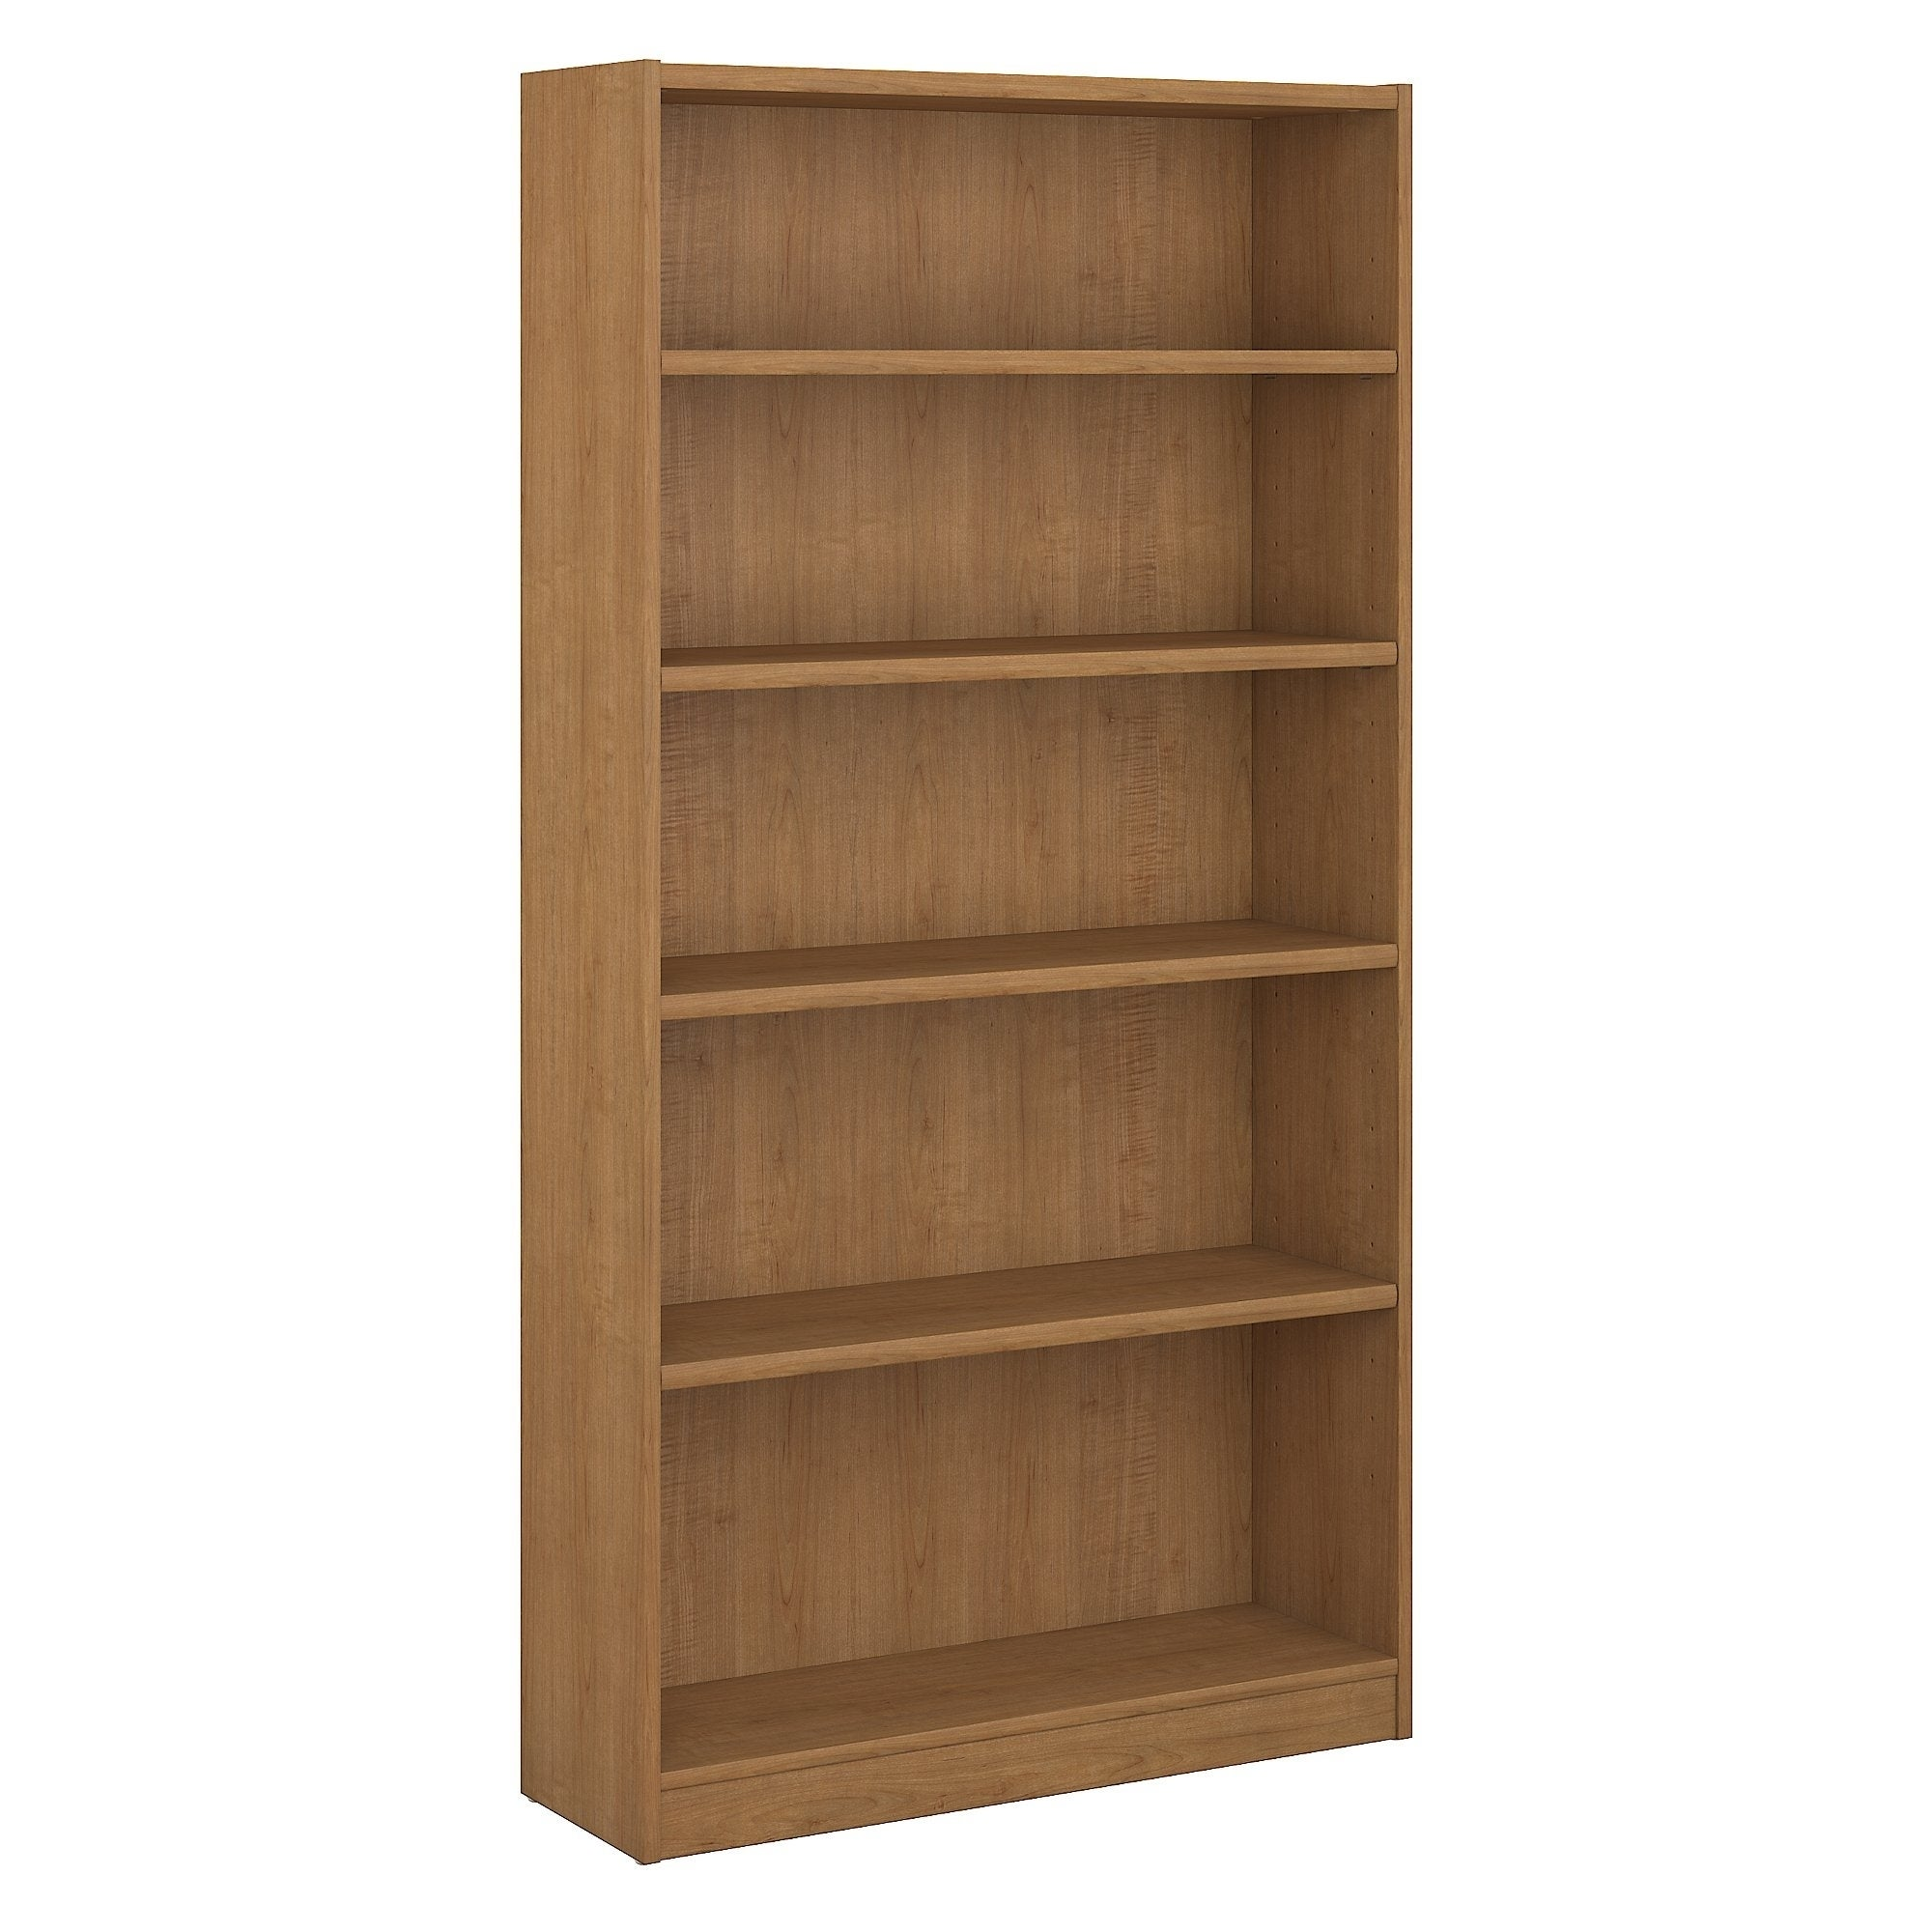 Pine Canopy Edelweiss Universal Multi Shelf Bookcase in snow